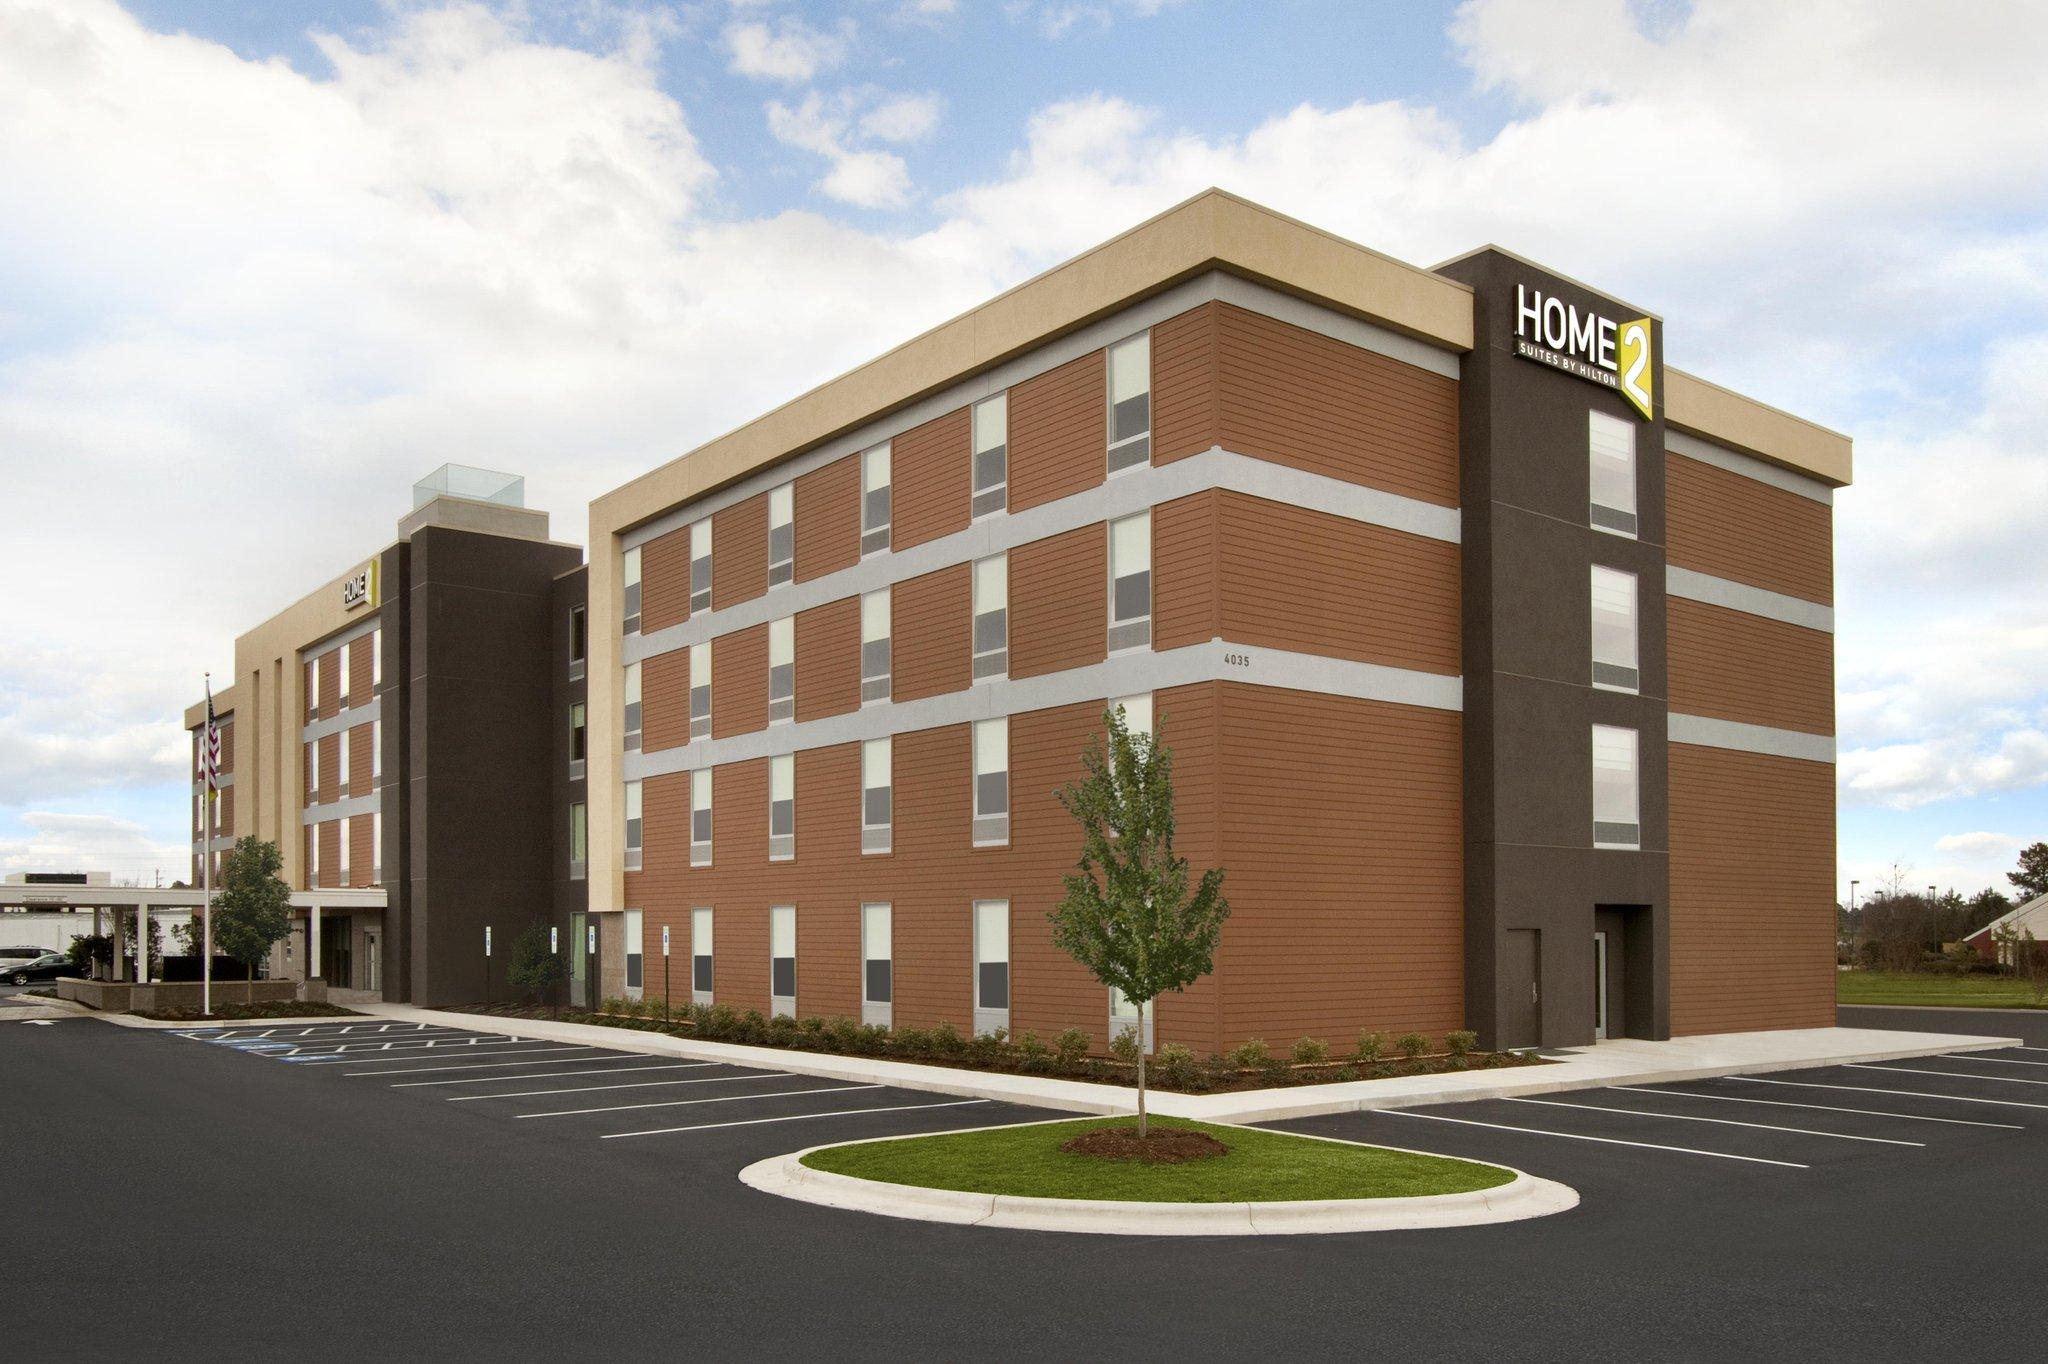 Home2 Suites By Hilton Fayetteville